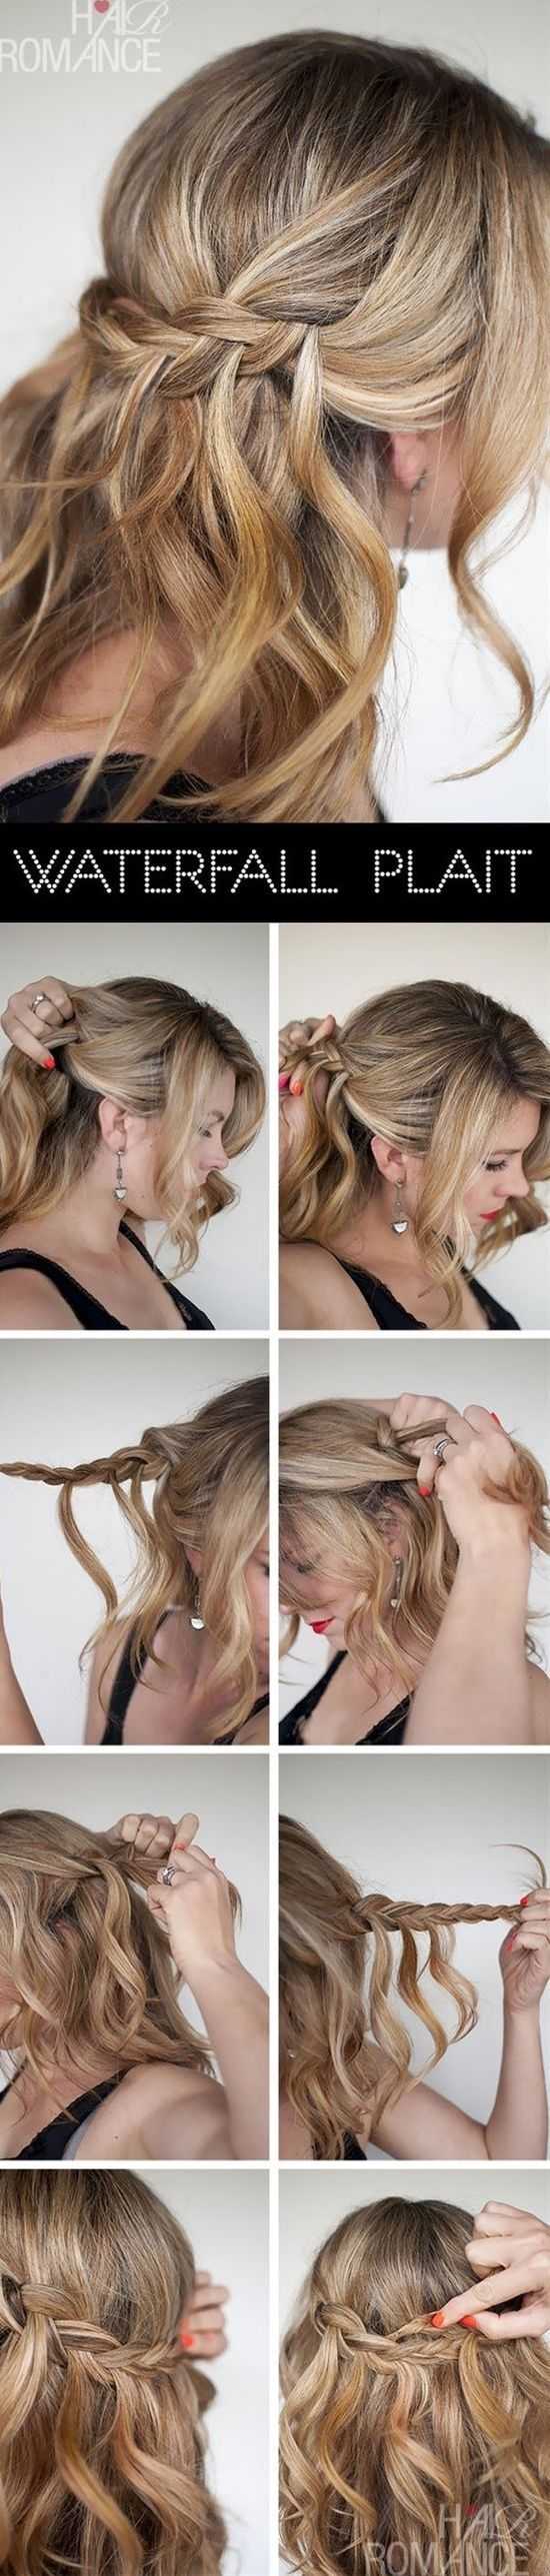 Simple French braid bun updo – DIY Step By Step Hair Tutorial